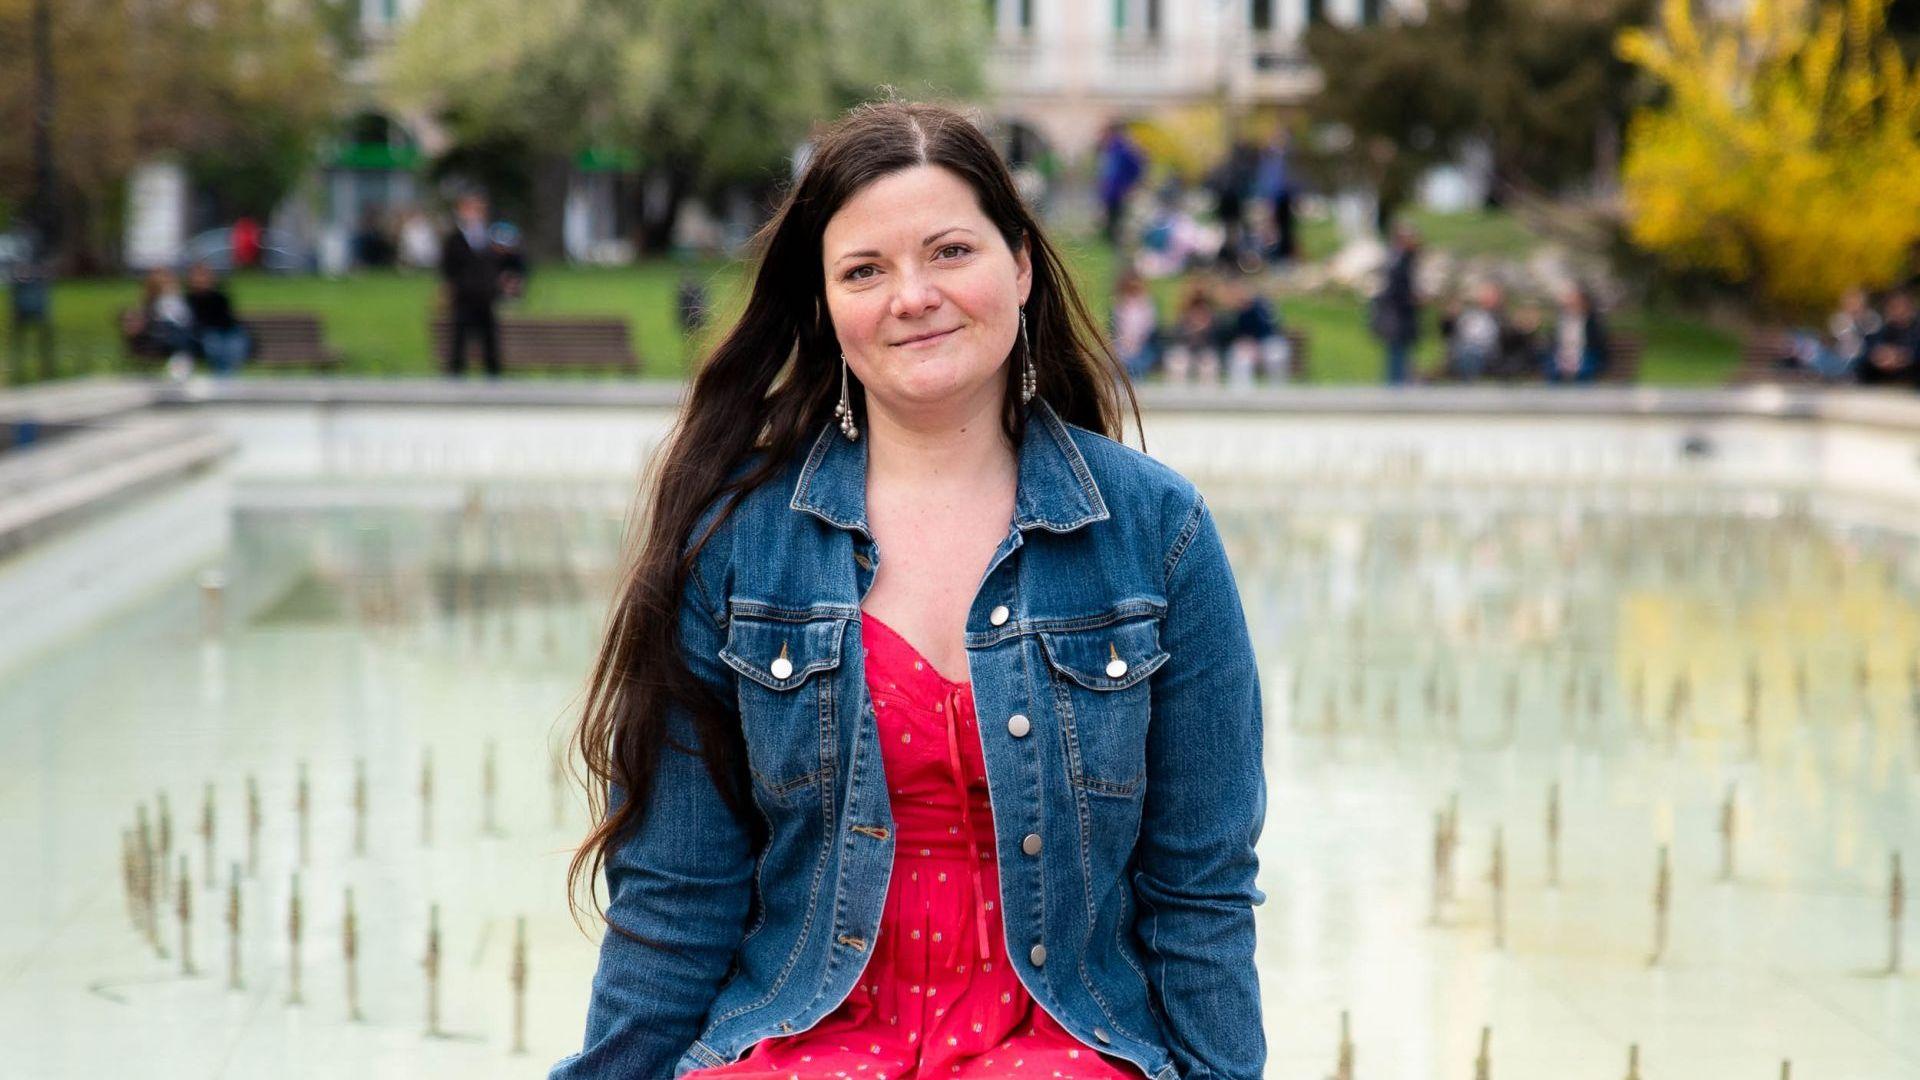 Истории за истинската красота: Казвам се Елена